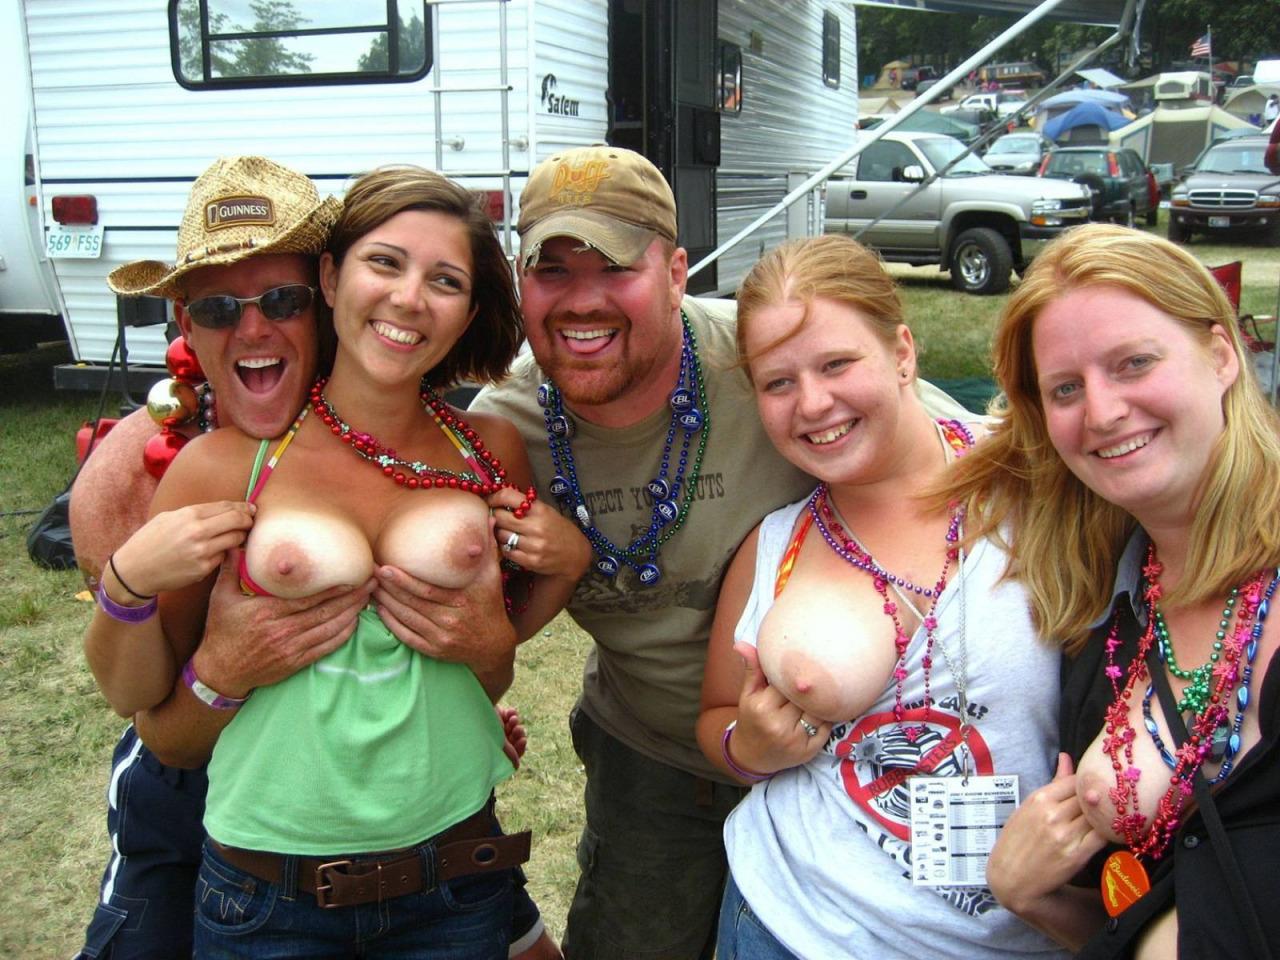 Big tits redneck nude